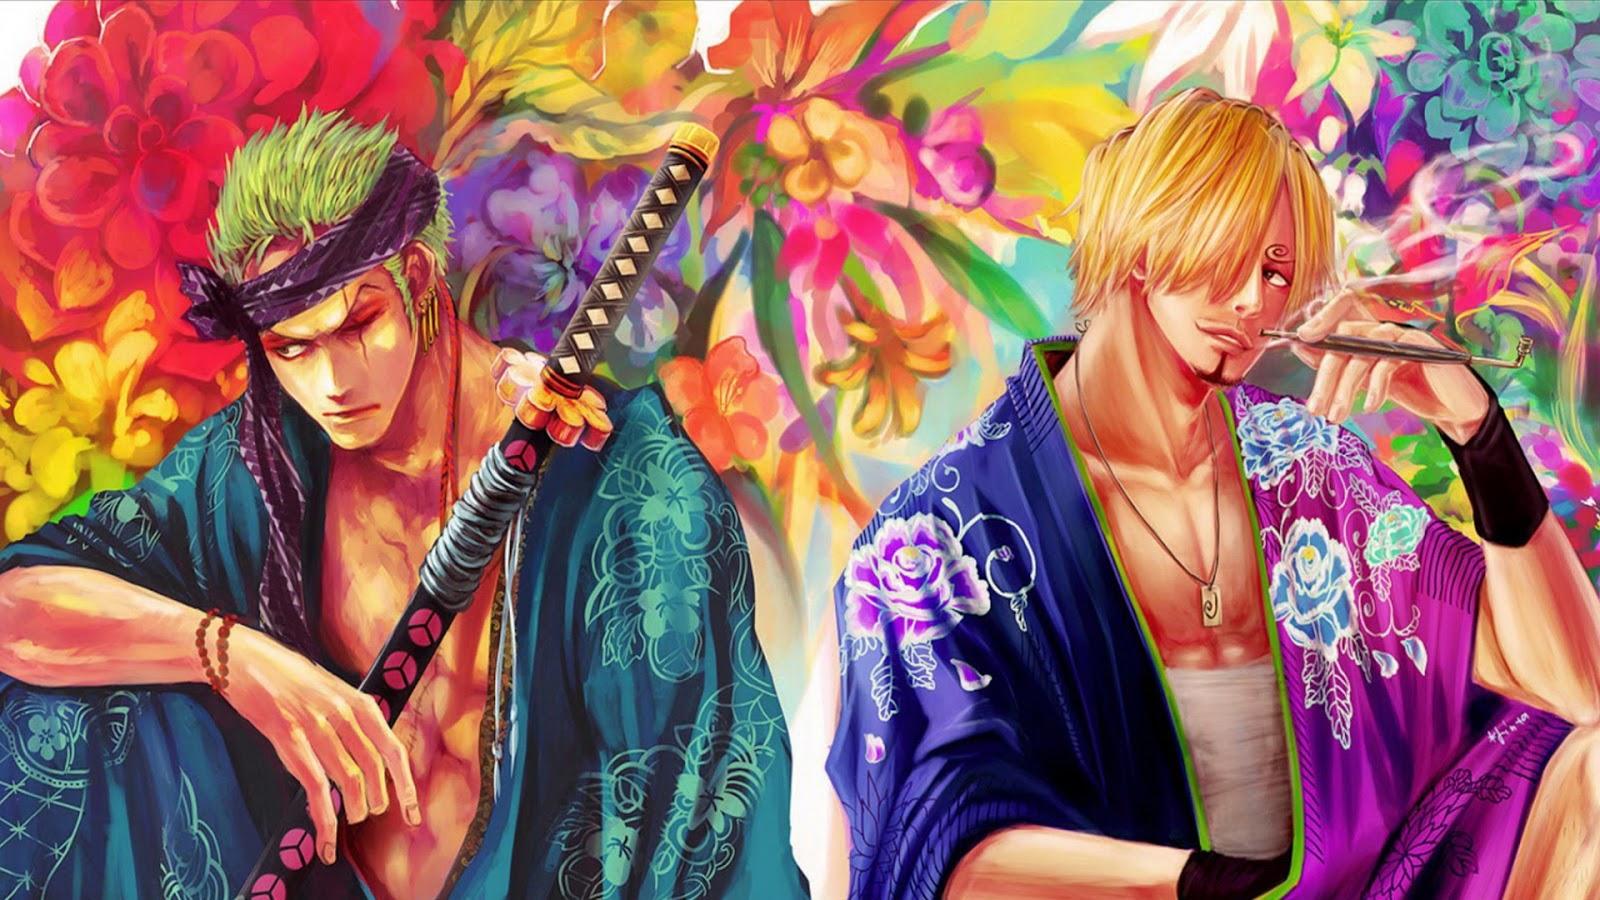 Tải Ảnh Zoro One Piece Full HD làm avatar ảnh nền